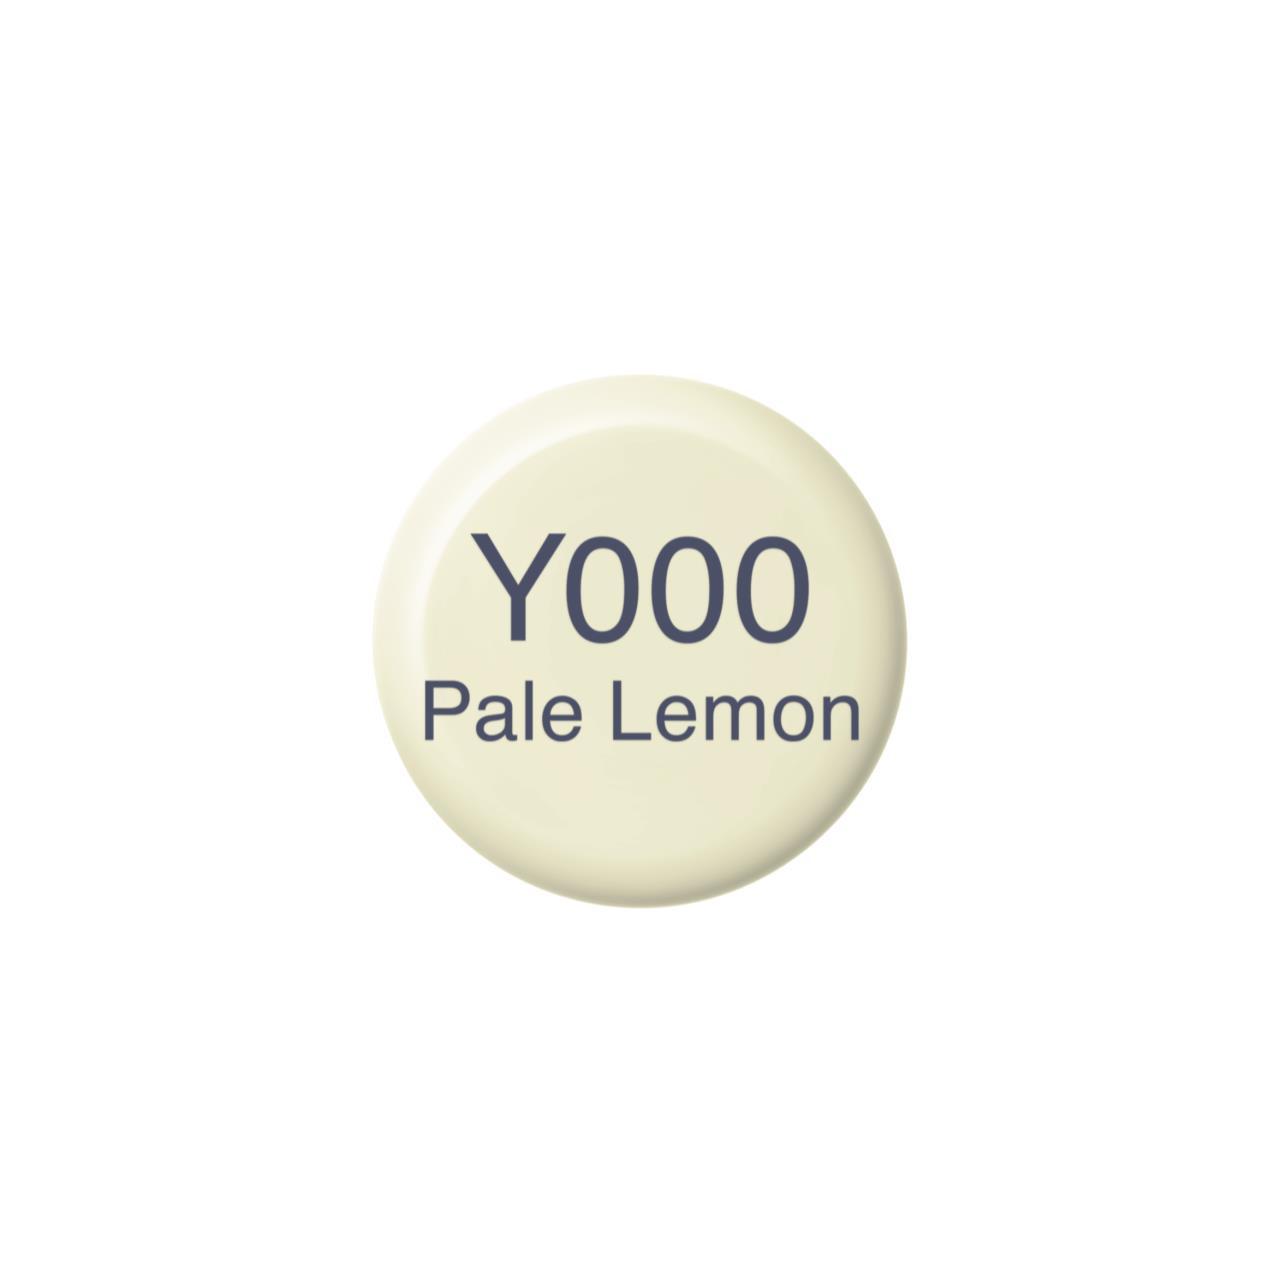 Y000 Pale Lemon, Copic Ink - 4511338058145